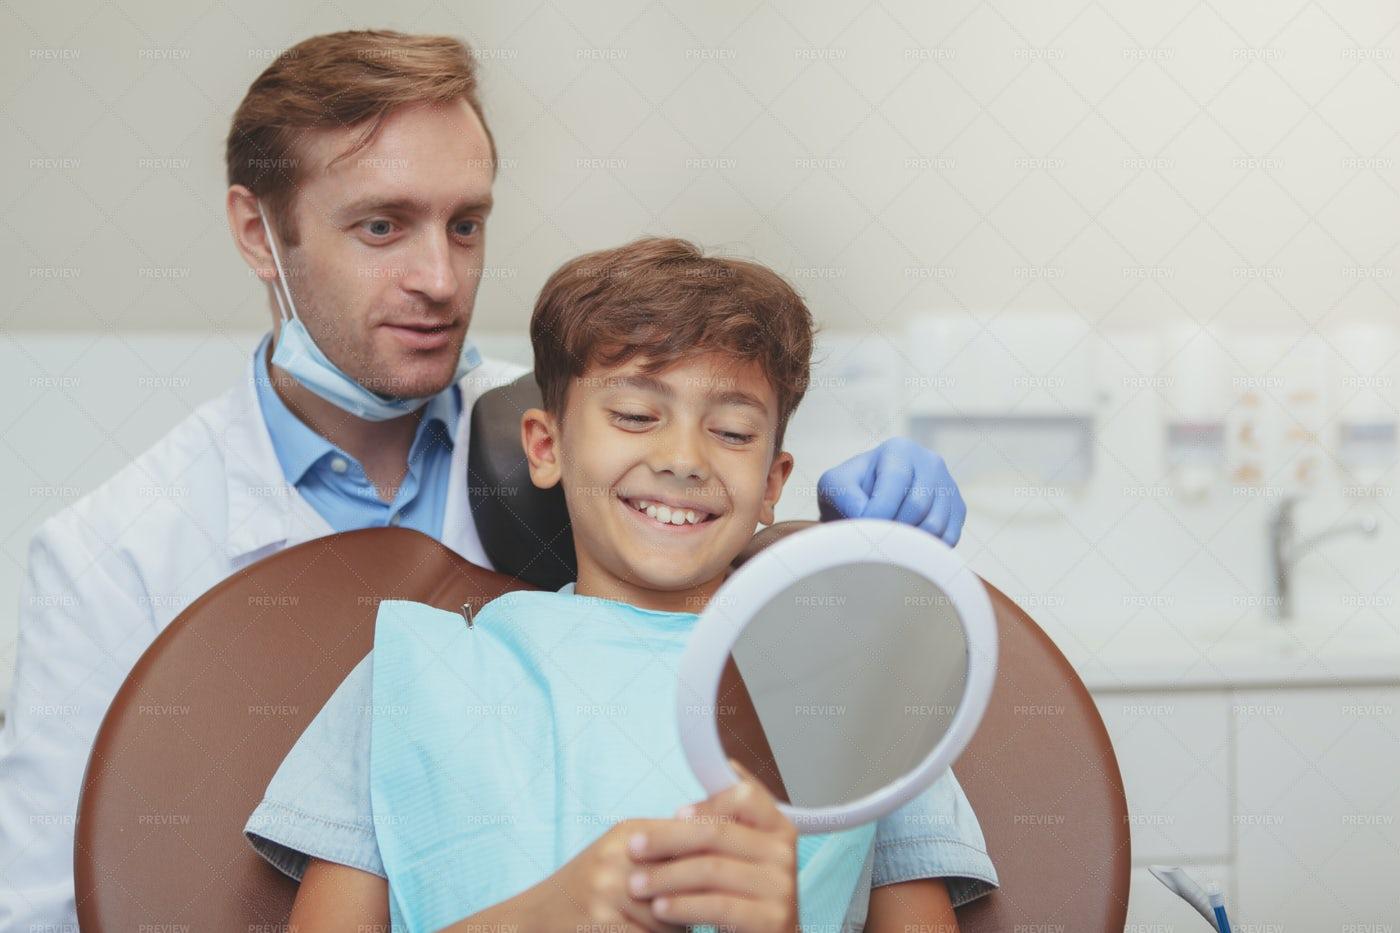 Happy Kid At The Dentist: Stock Photos